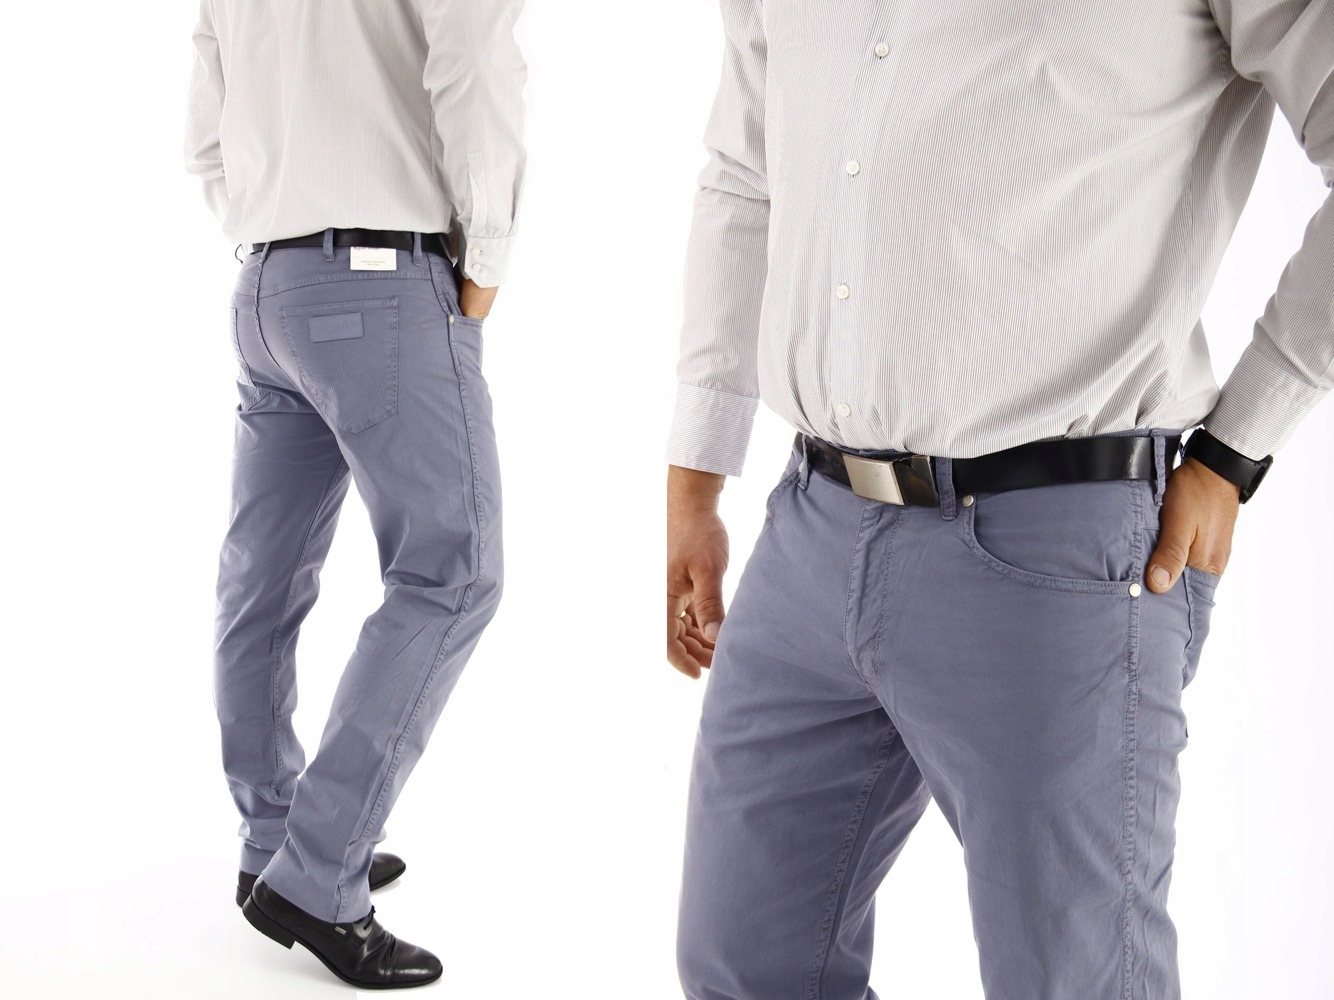 Wrangler Greensboro Flinston Blue spodnie W36 L30